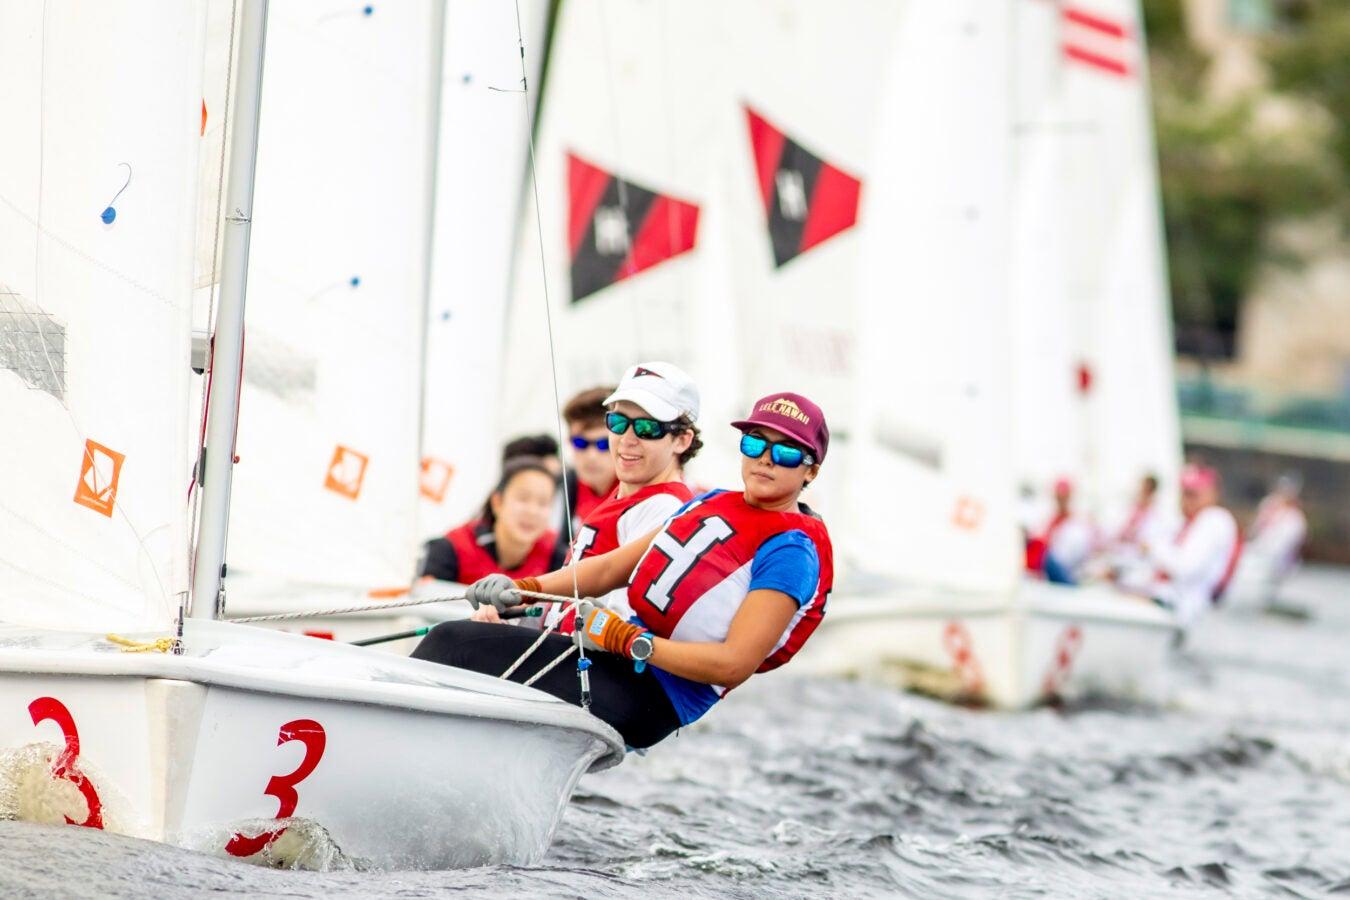 Eli Burnes '22, left, is the skipper; Pomai Ogata '24 crews.